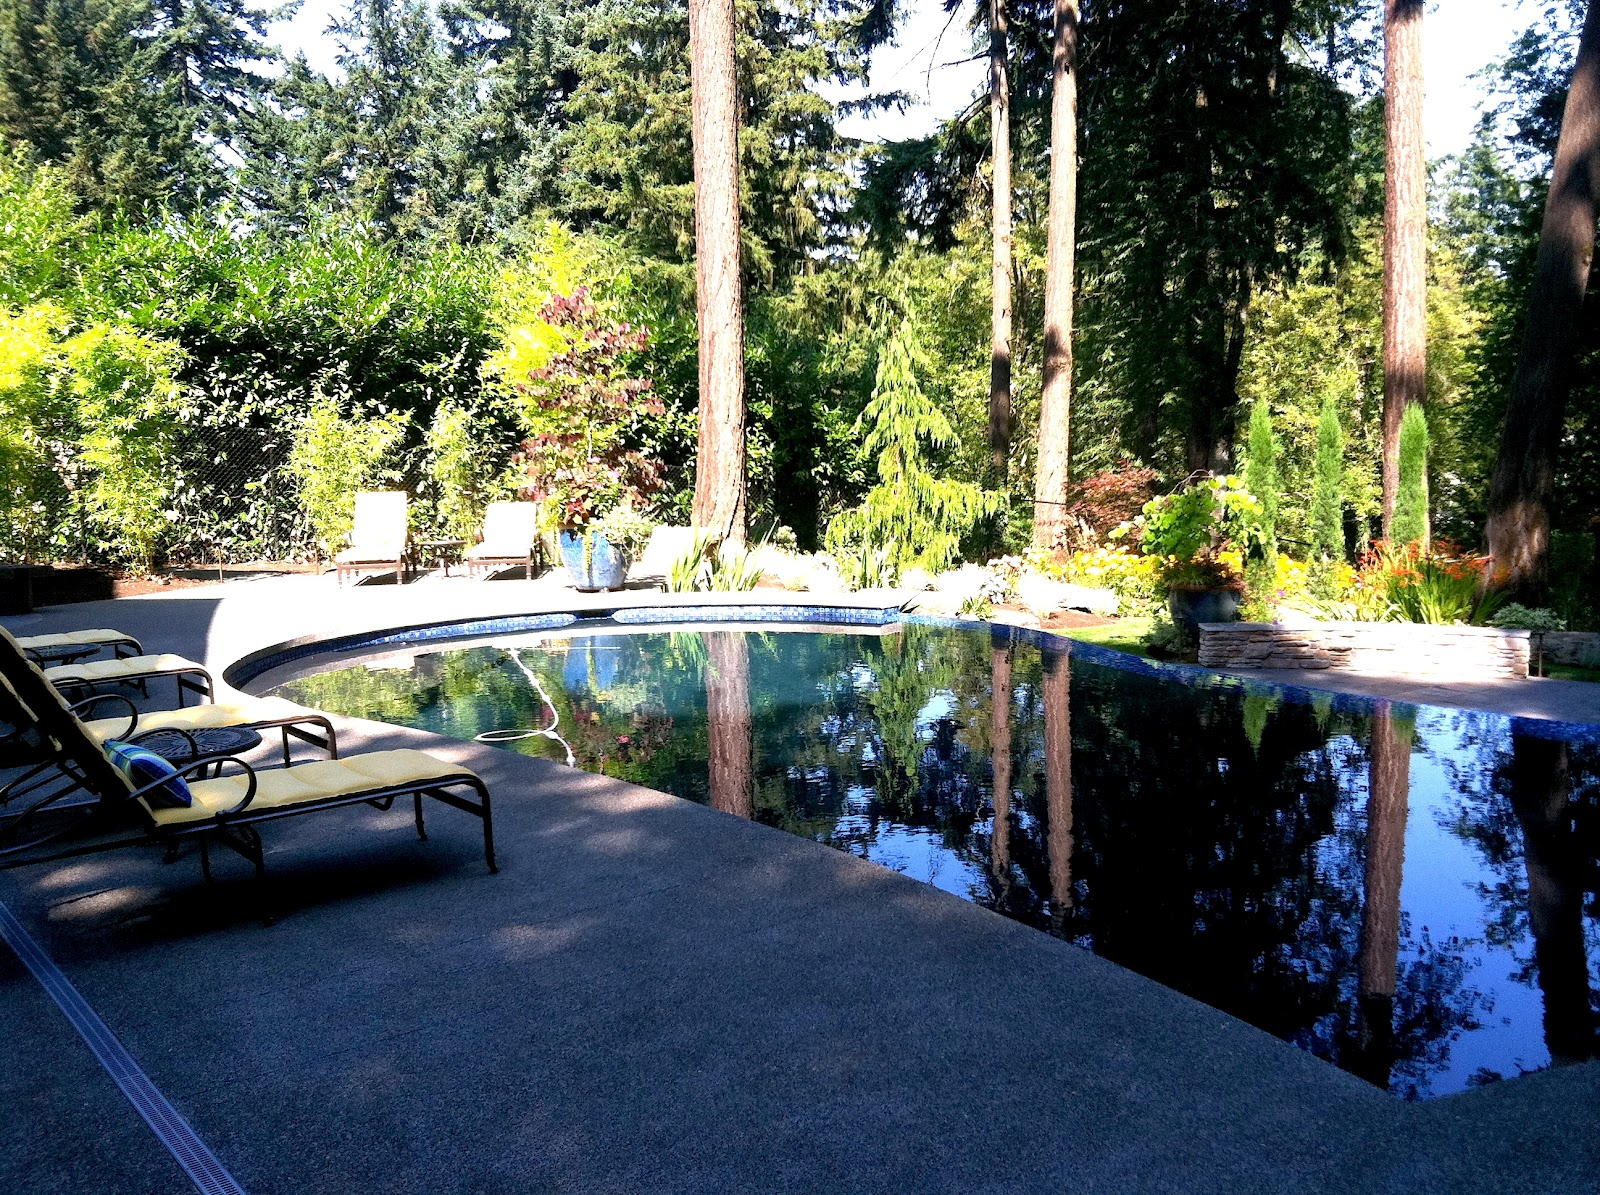 Portland Oregon Interior Design Blog Lake Oswego Swimming Pool Outdoor Kitchen And Living Room